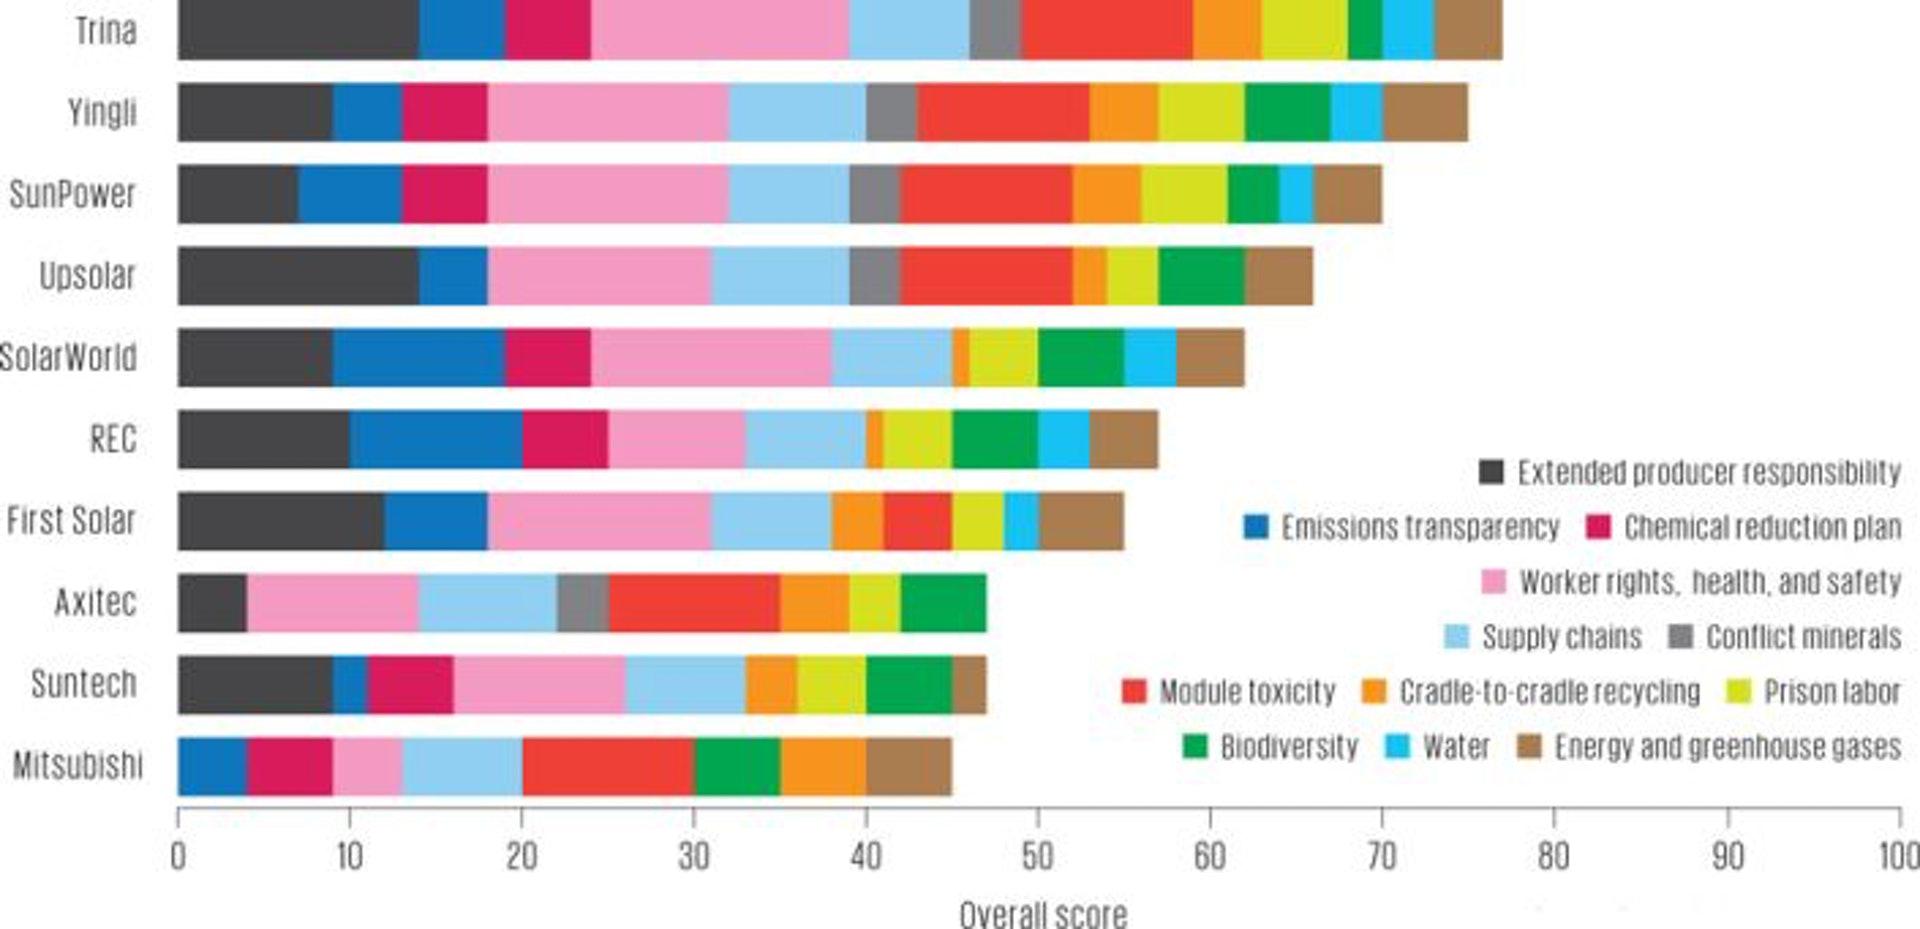 2013年太陽能電池製造商的環境績效。(來源:Silicon Valley Toxics Coalition)